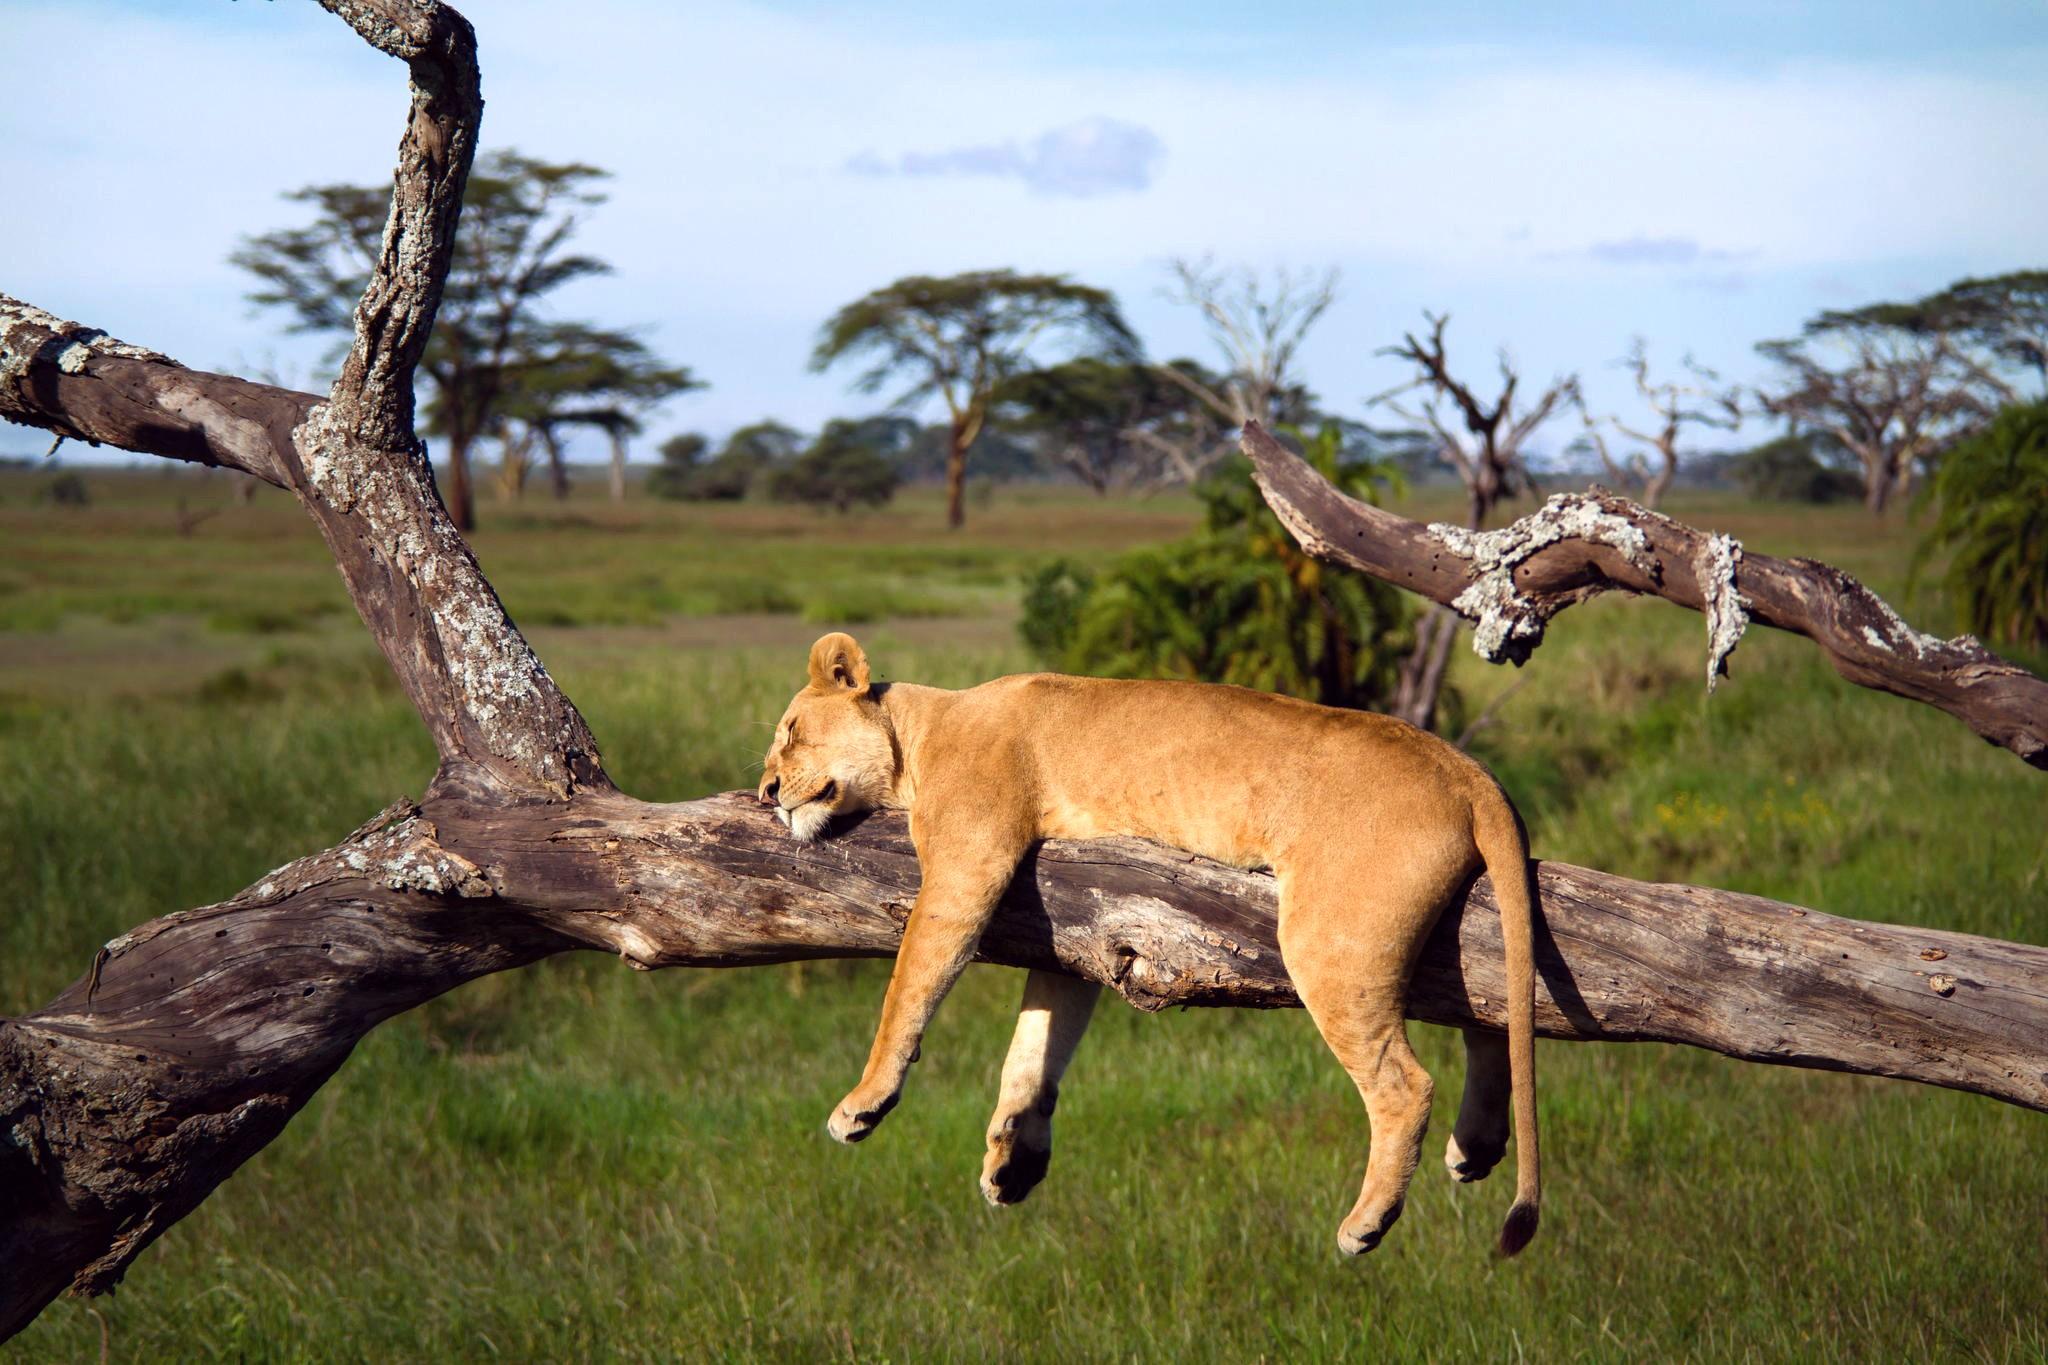 https://get.wallhere.com/photo/deer-animals-nature-sleeping-lion-wildlife-impala-Safari-fauna-mammal-savanna-white-tailed-deer-288823.jpg